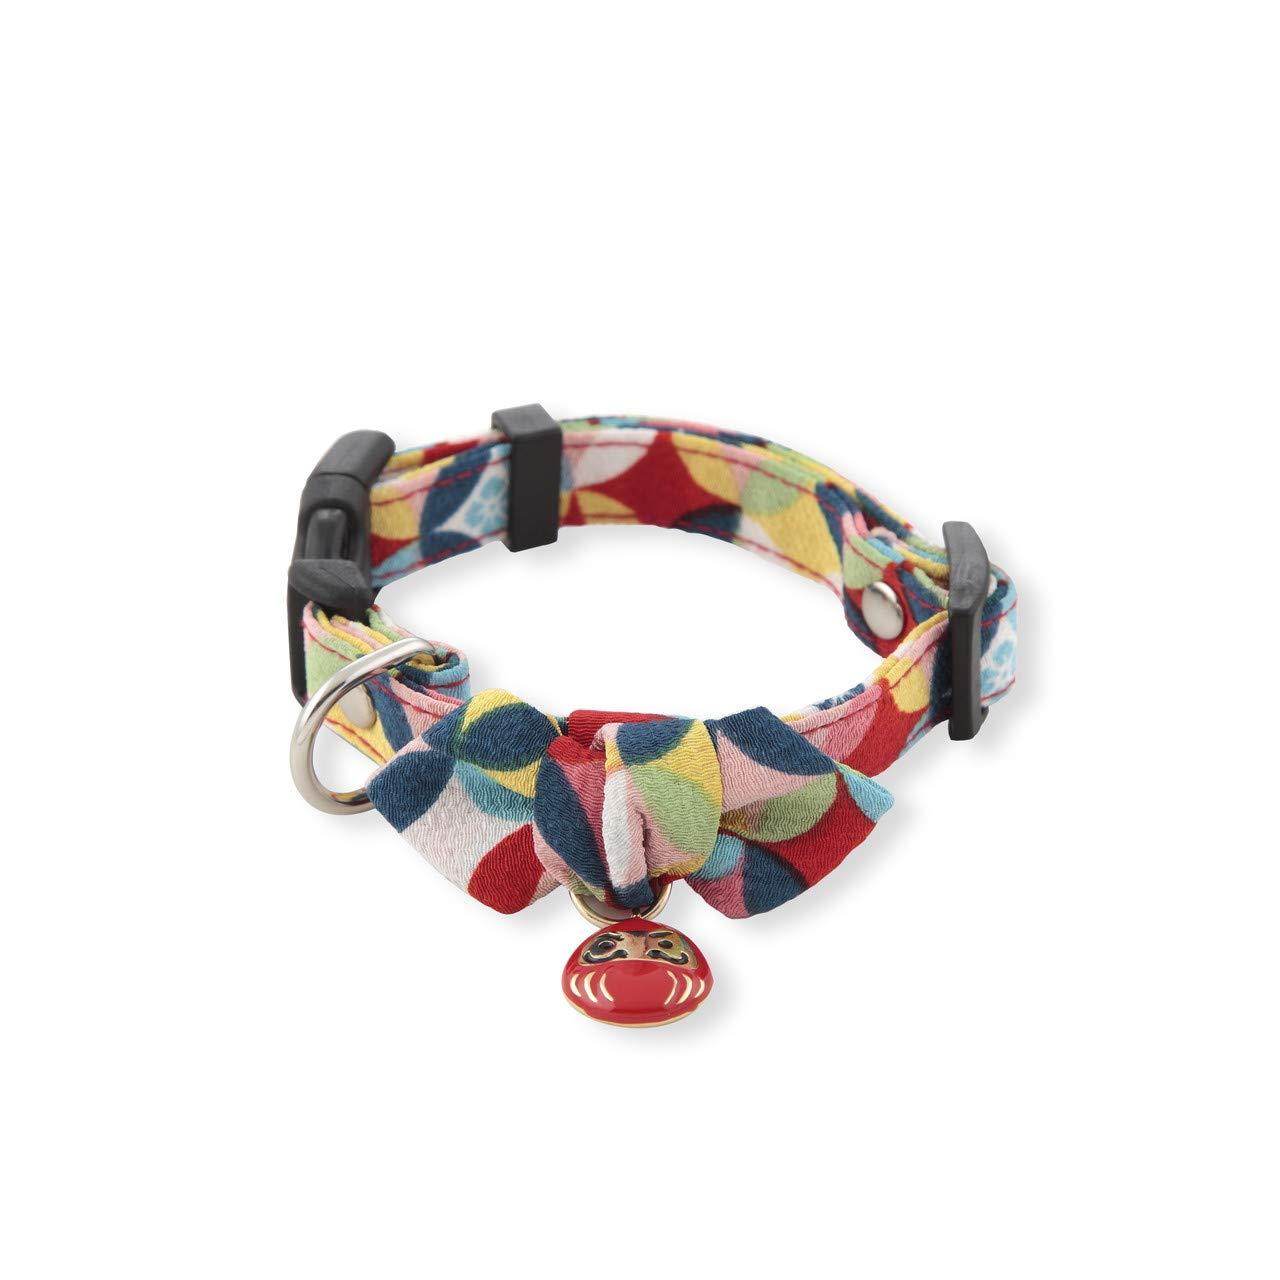 Necoichi Daruma Charm Dog (Collar, Medium, Red) by Necoichi